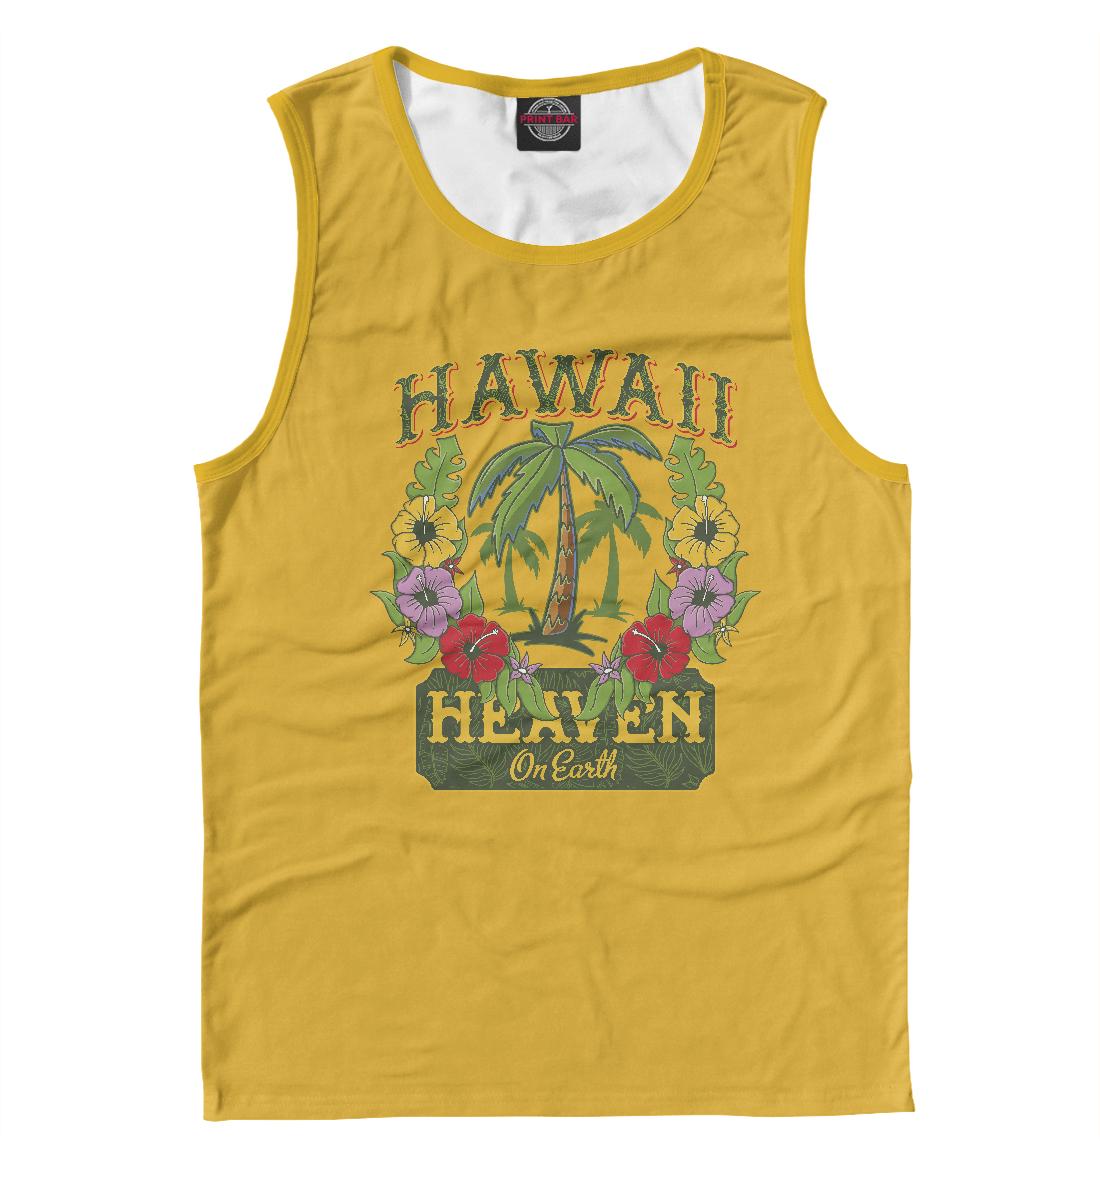 Фото - Hawaii - heaven on earth barbara cartland a heaven on earth